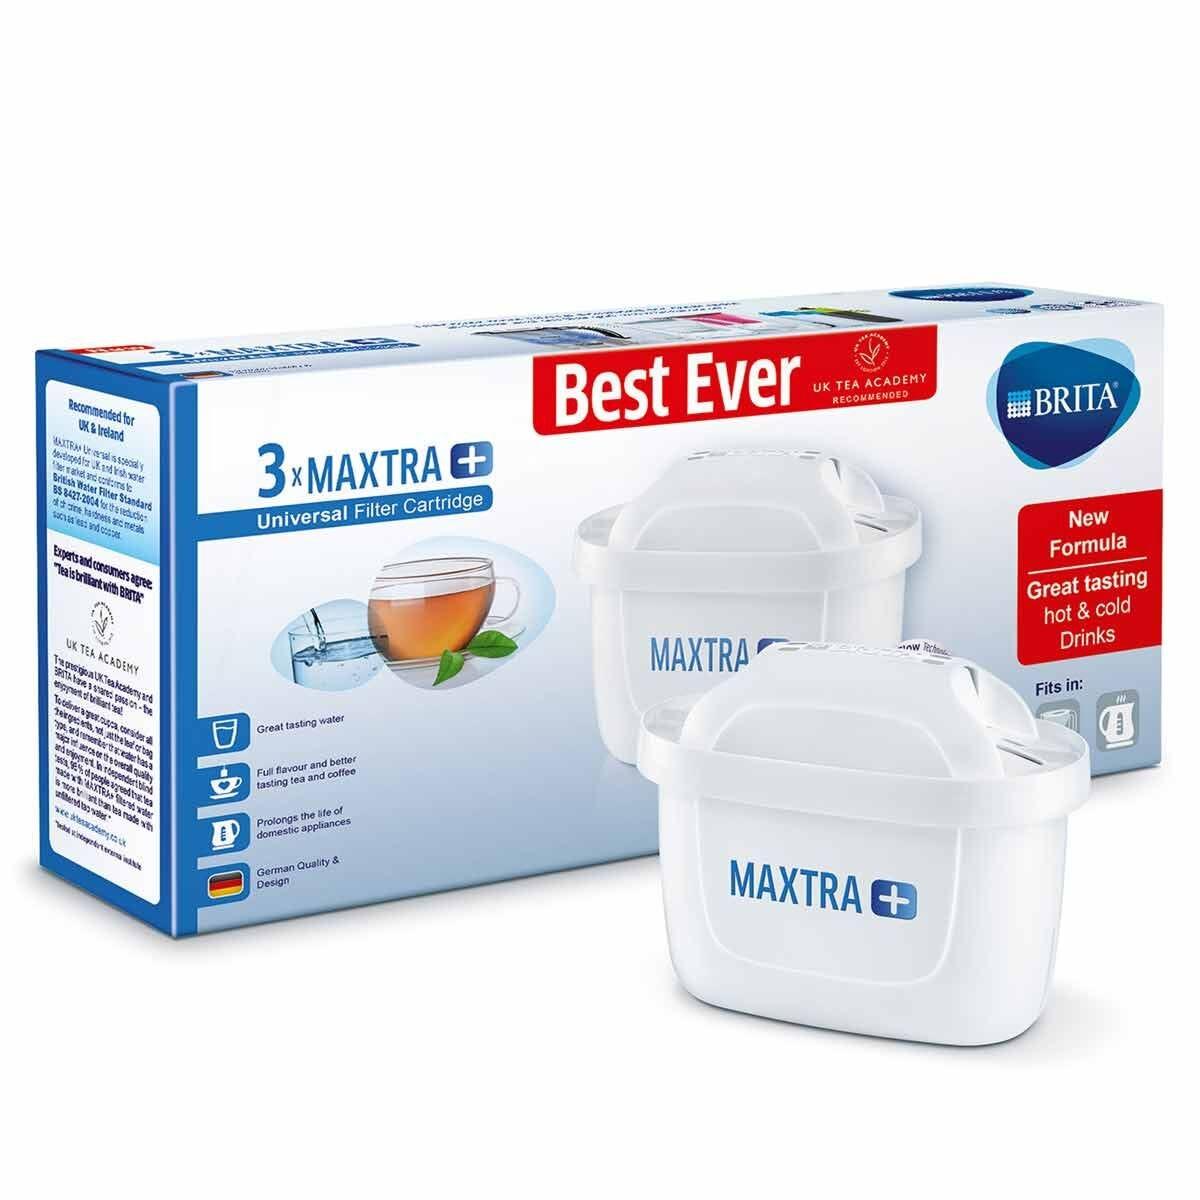 BRITA MAXTRA Plus Filter Cartridge Pack of 3